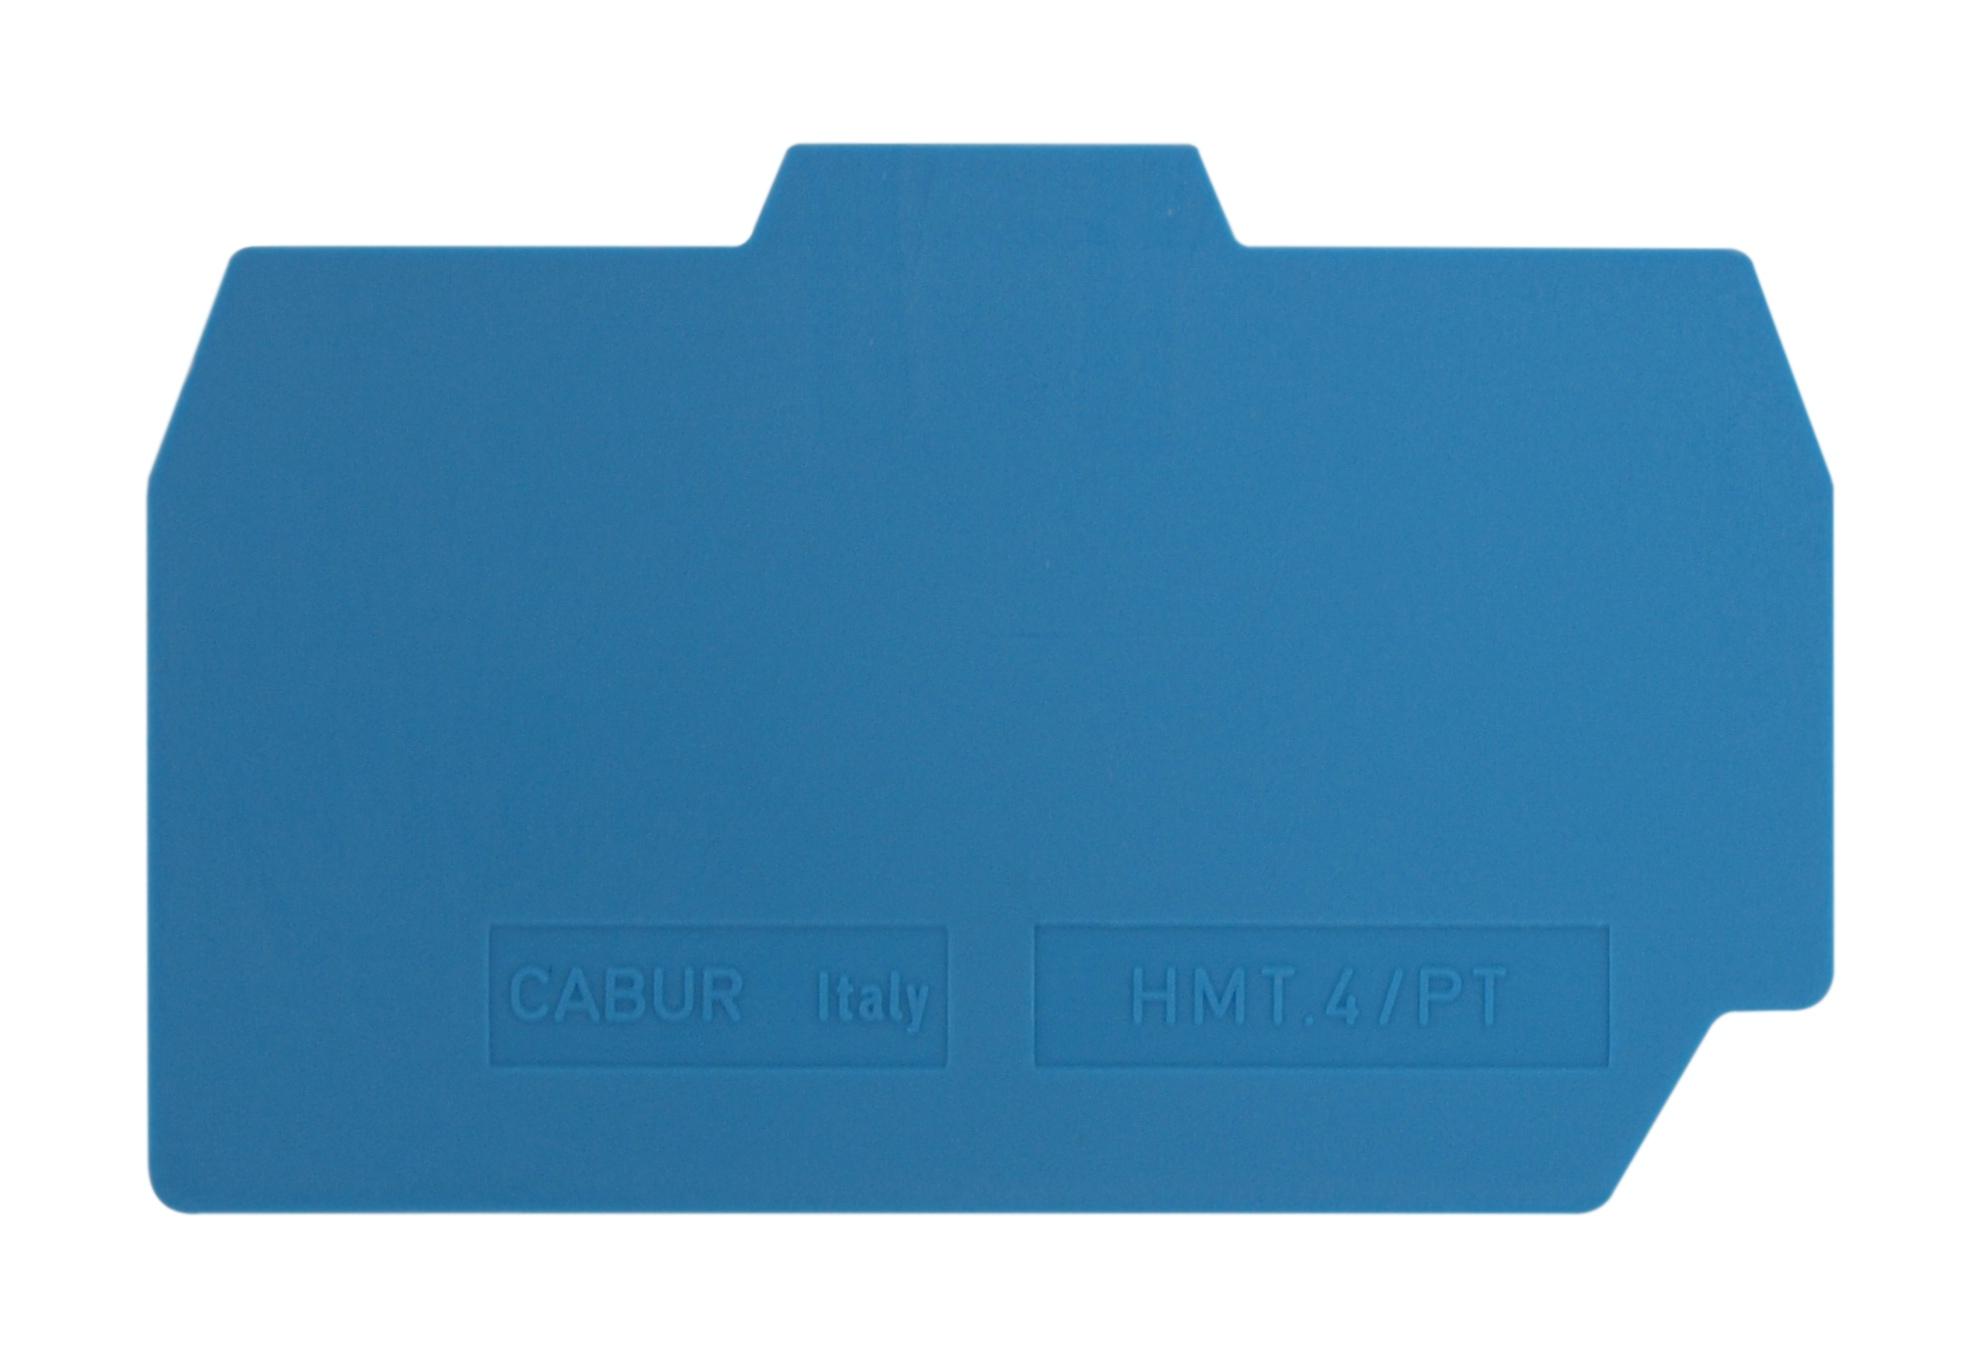 1 Stk Endplatte für Federkraftklemme HMM 4mm², blau IK201204--